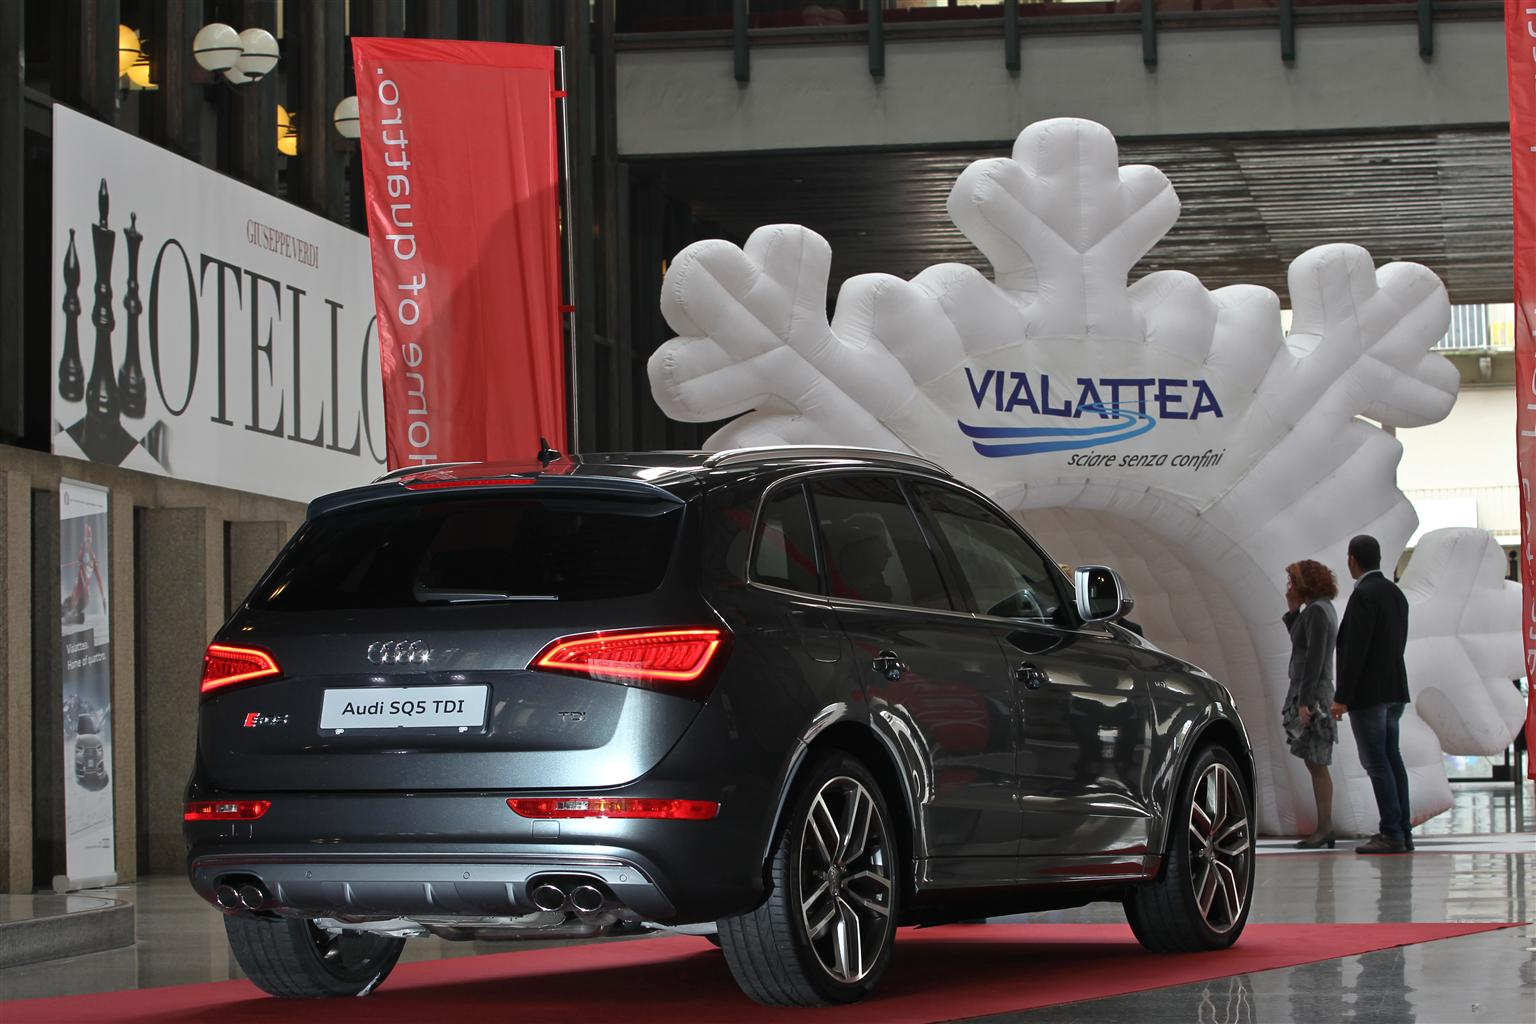 Audi Italia partner del comprensorio Vialattea